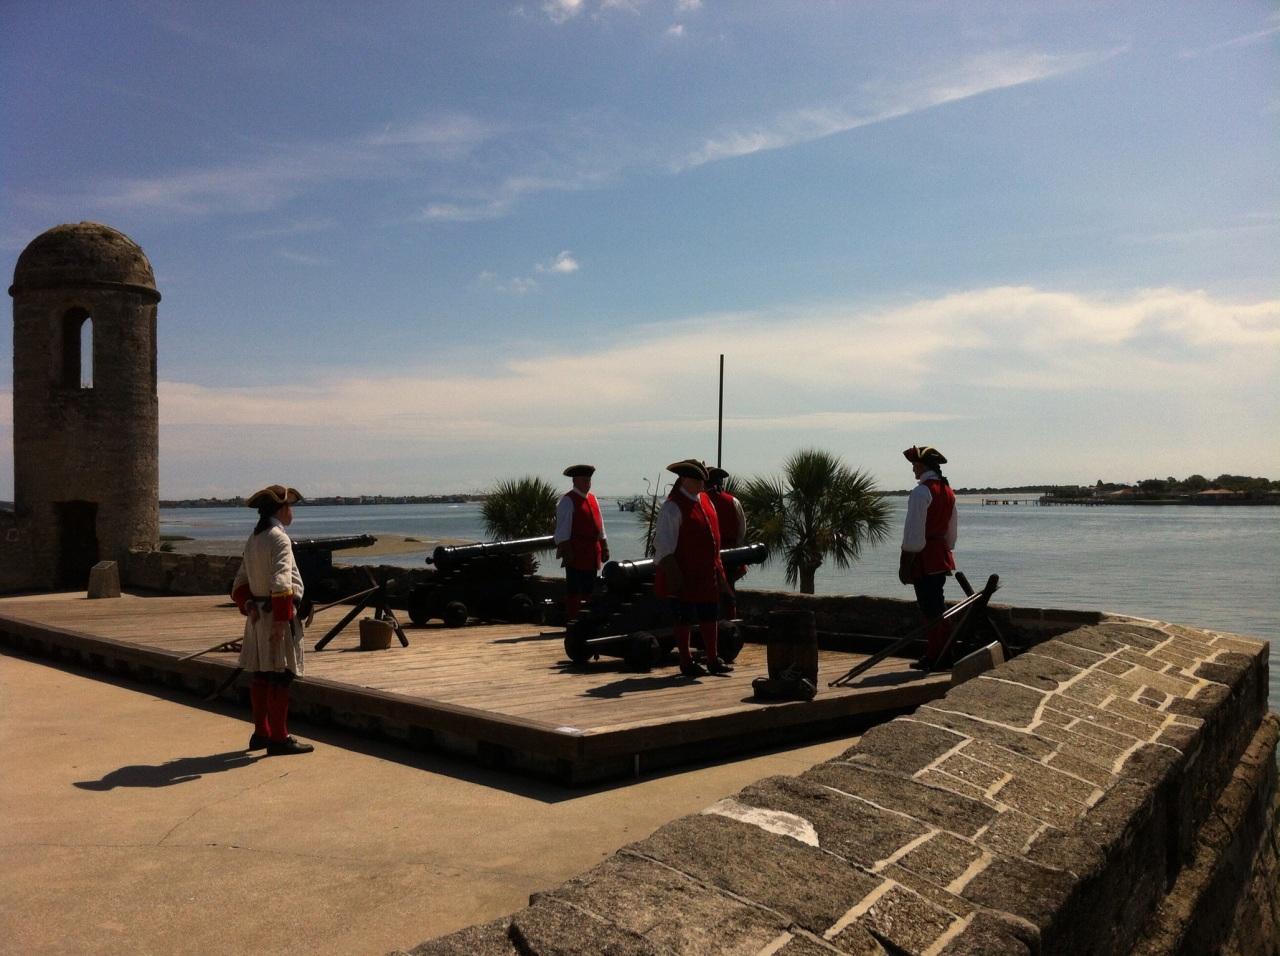 Spanish gunnery demonstration, Castillo de San Marcos, St. Augustine, Florida. [Photo by me, 2014.]